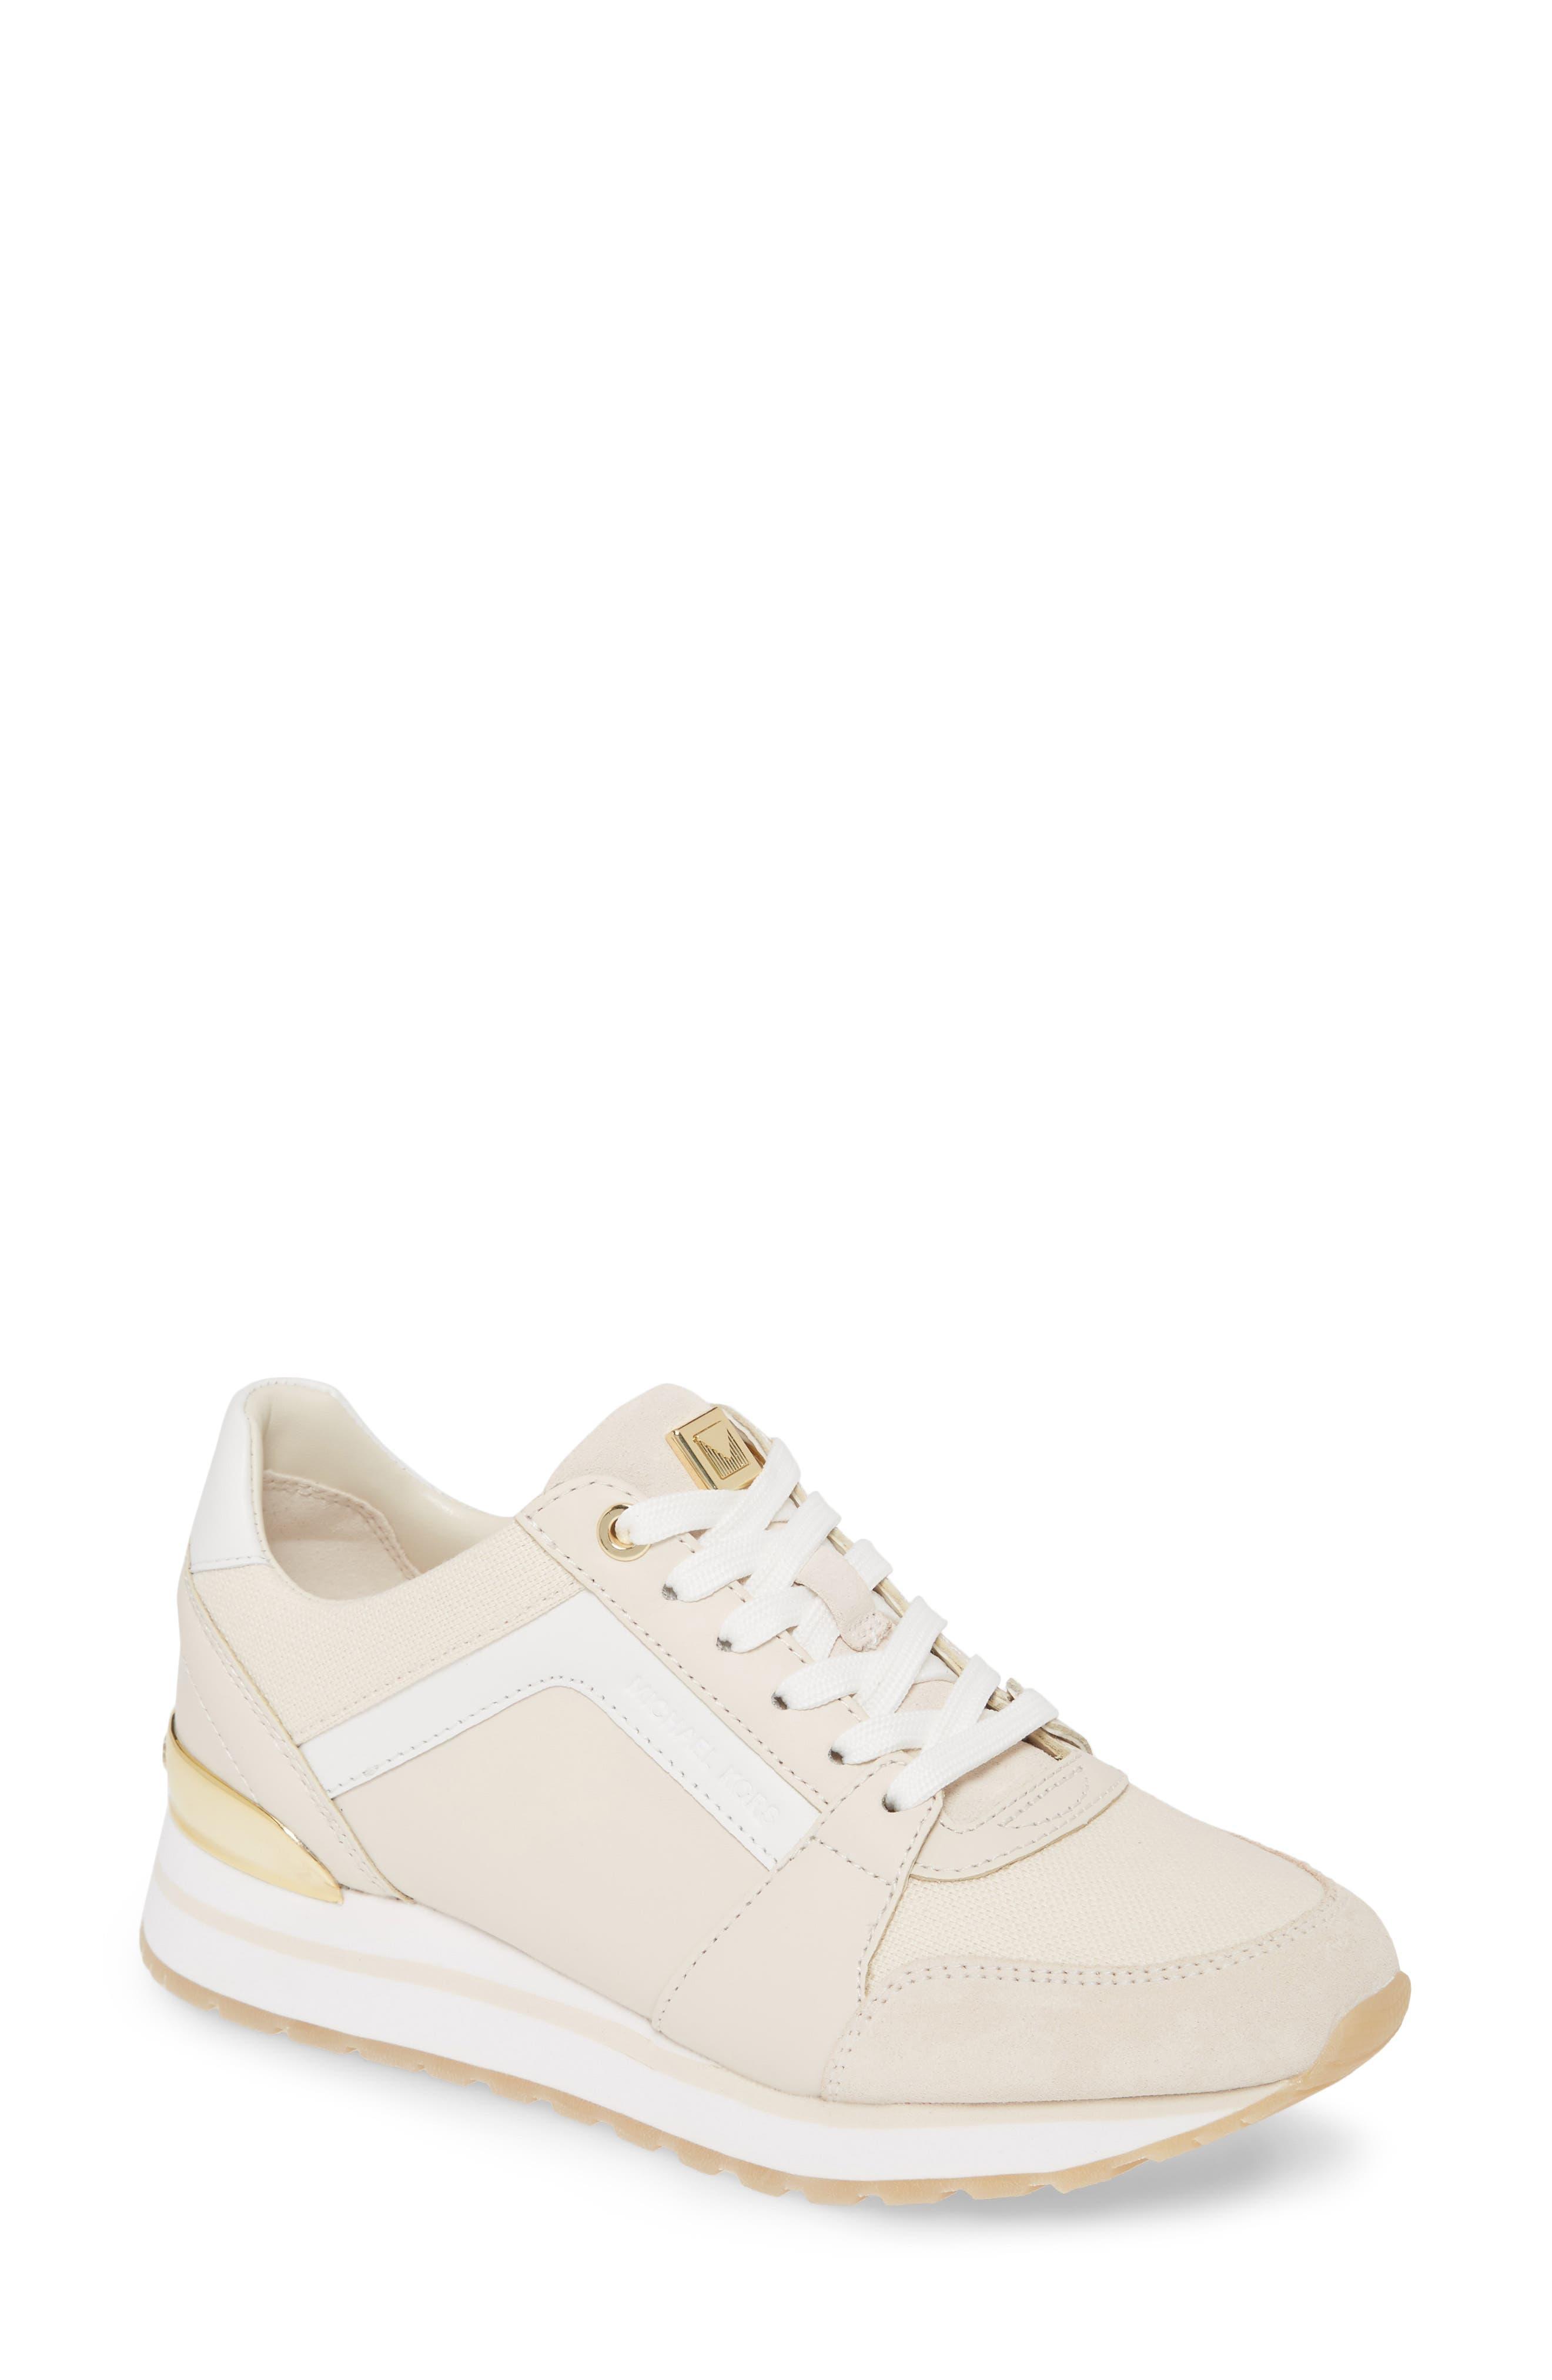 Michael Michael Kors Billie Perforated Sneaker- Ivory